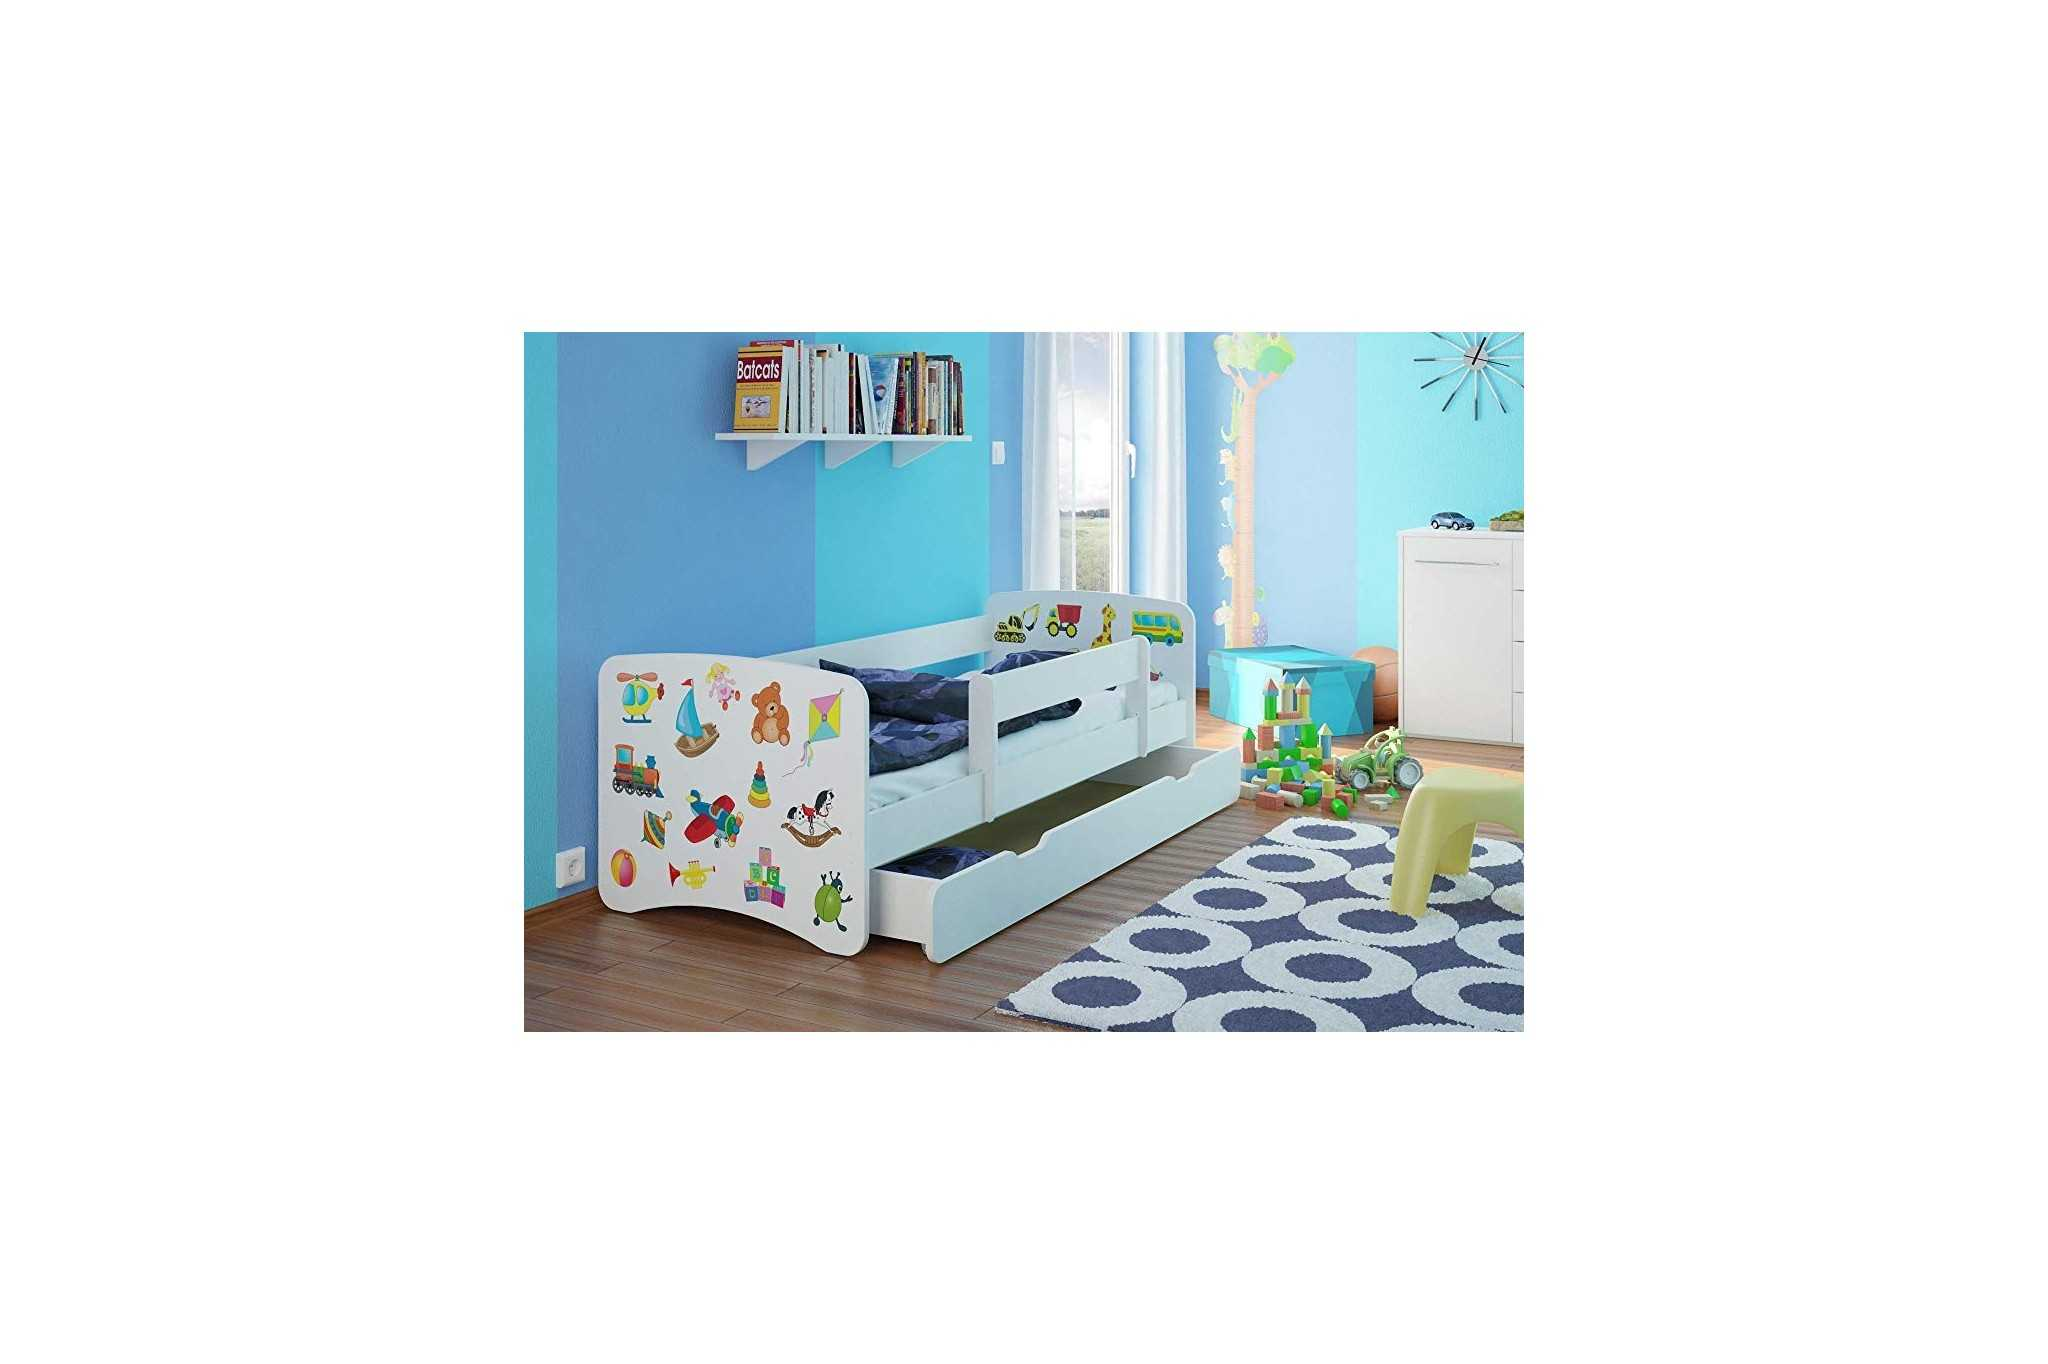 kinderbett mit cars kinderbett mit stauraum ca x cm with. Black Bedroom Furniture Sets. Home Design Ideas